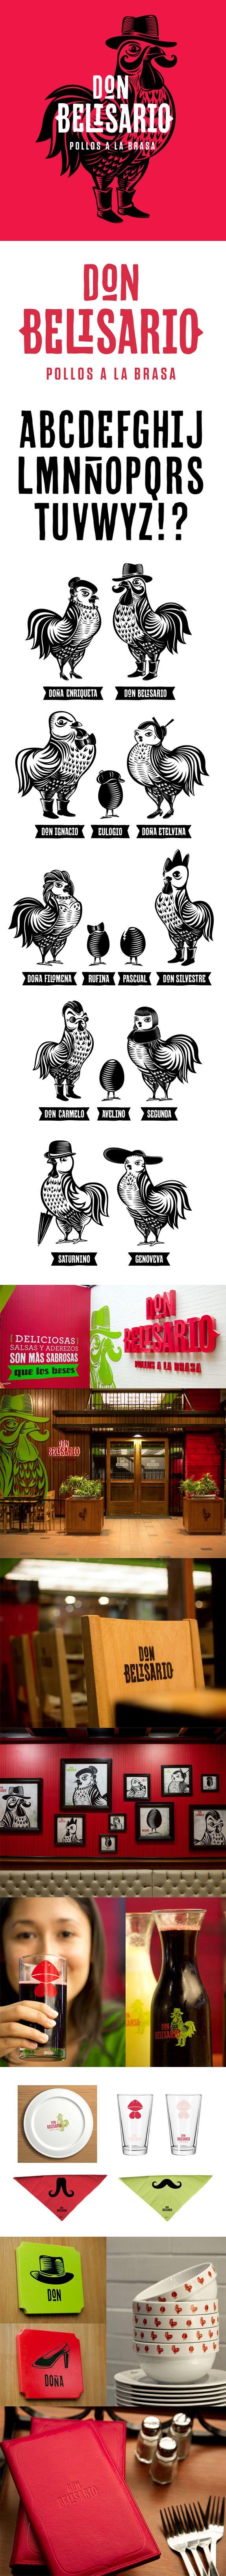 Don-Belisario-Branding